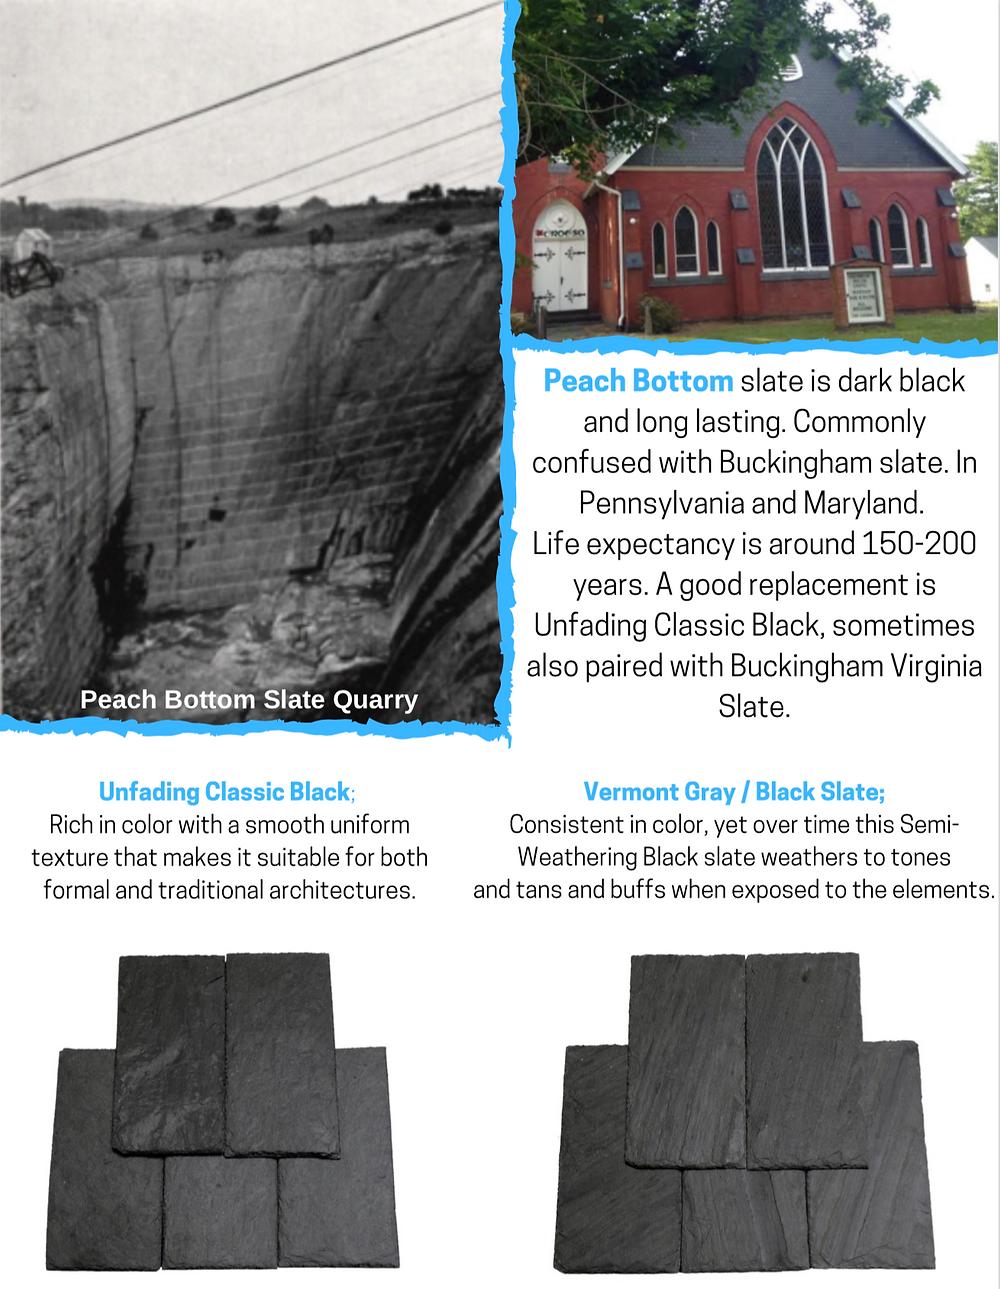 Peach Bottom Slate - Unfading Classic Black Slate